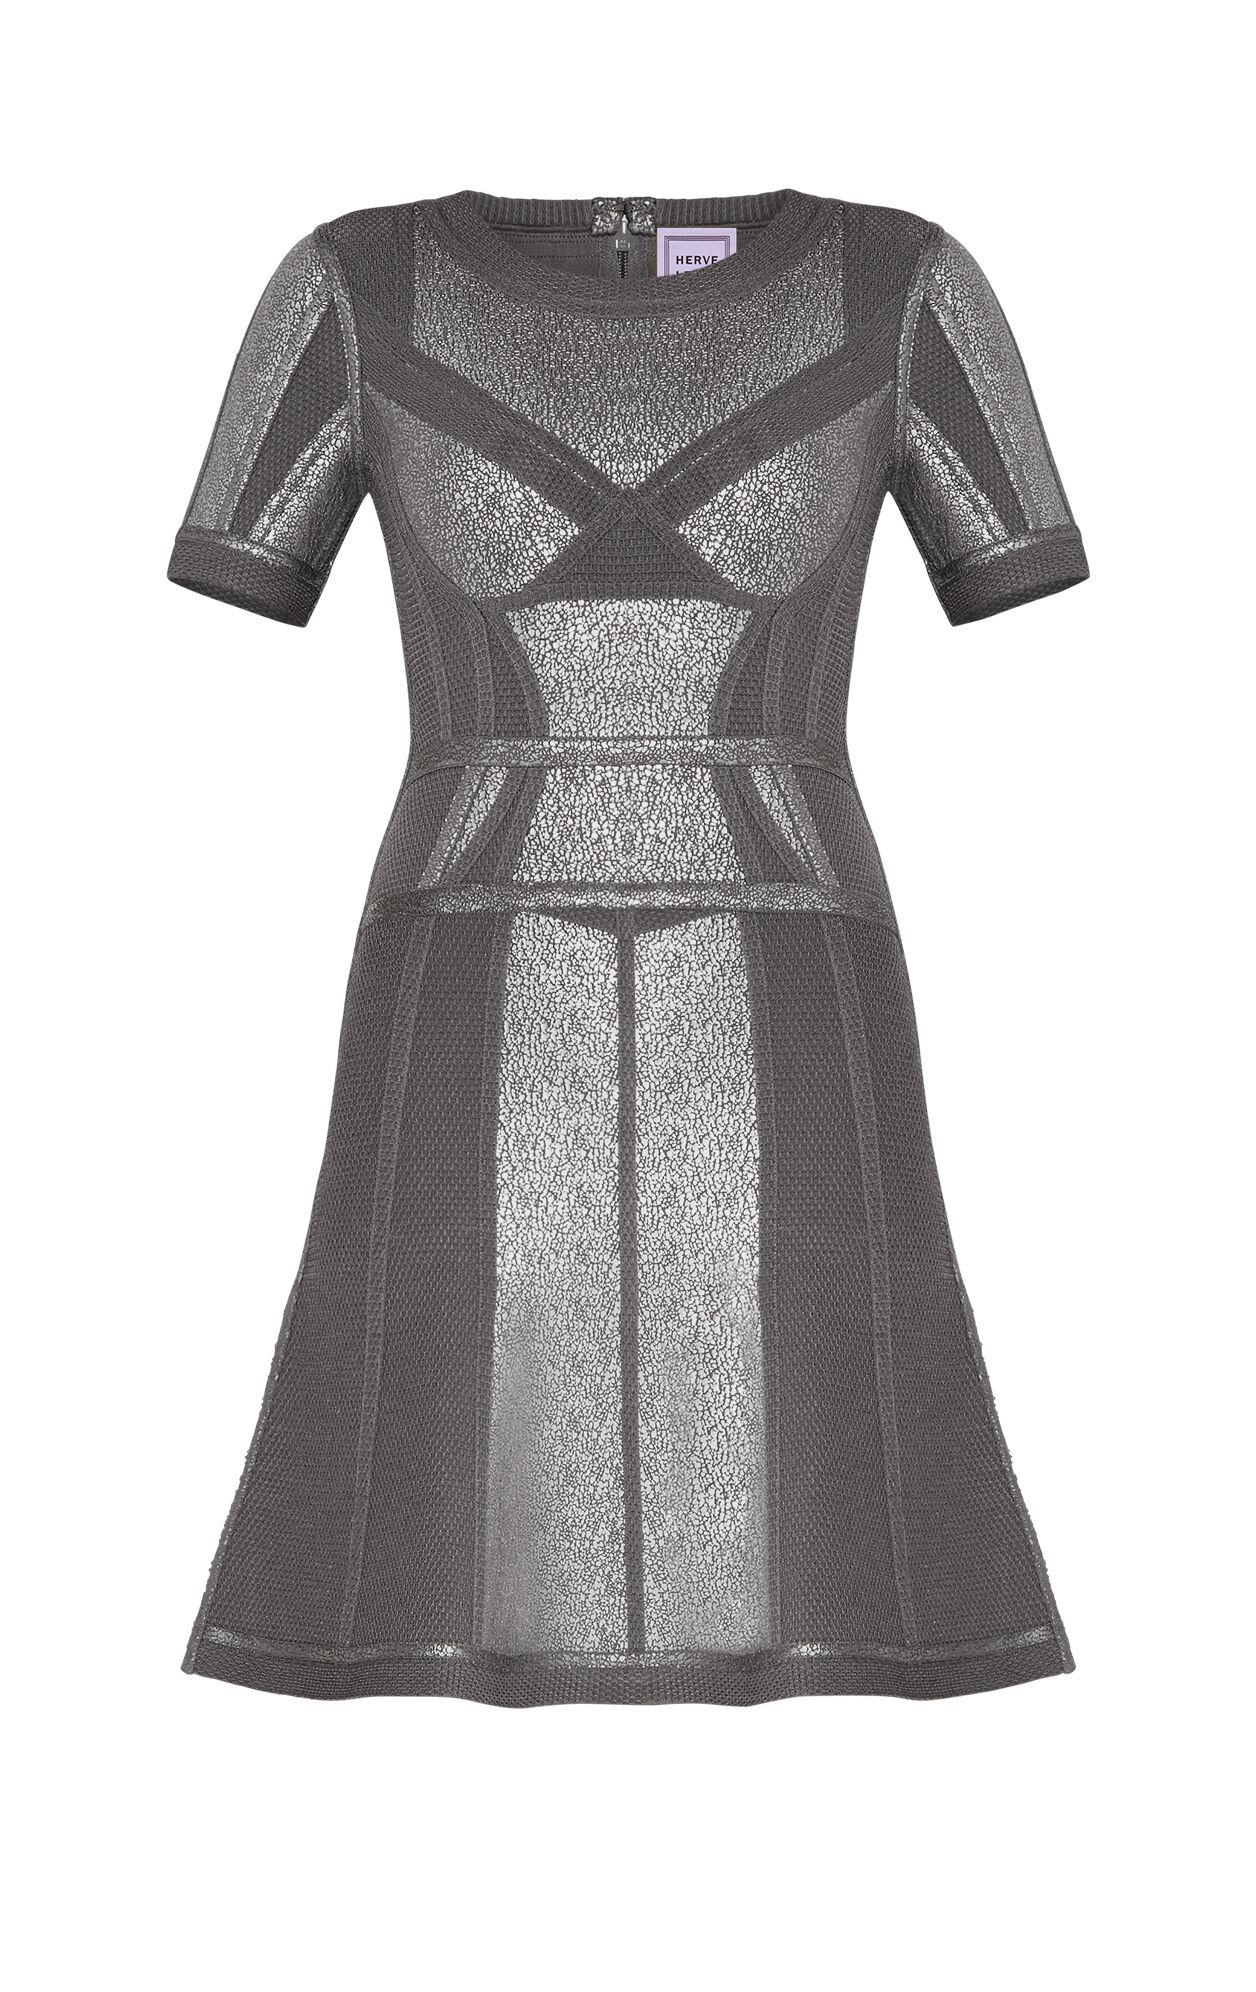 Mcckenne Crackled Metallic Foil Flare Dress